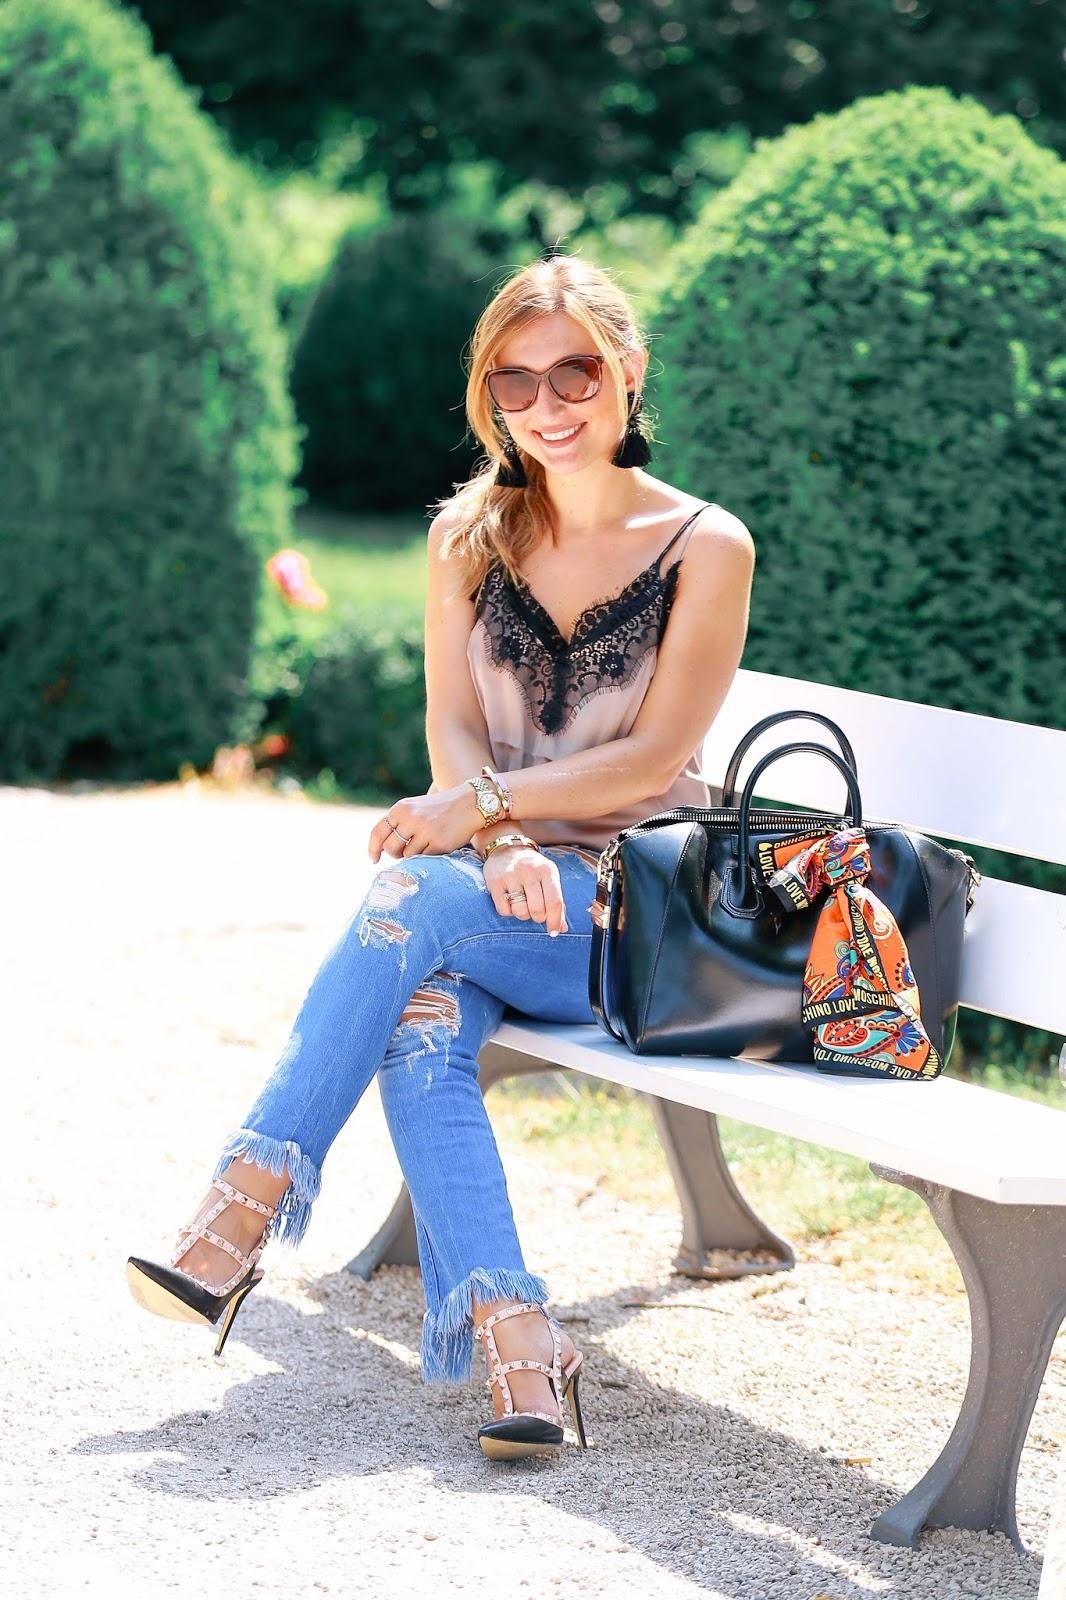 deutsche-blogger-ripped-jeans-zerissene-jeans-wa-zieht-man-an